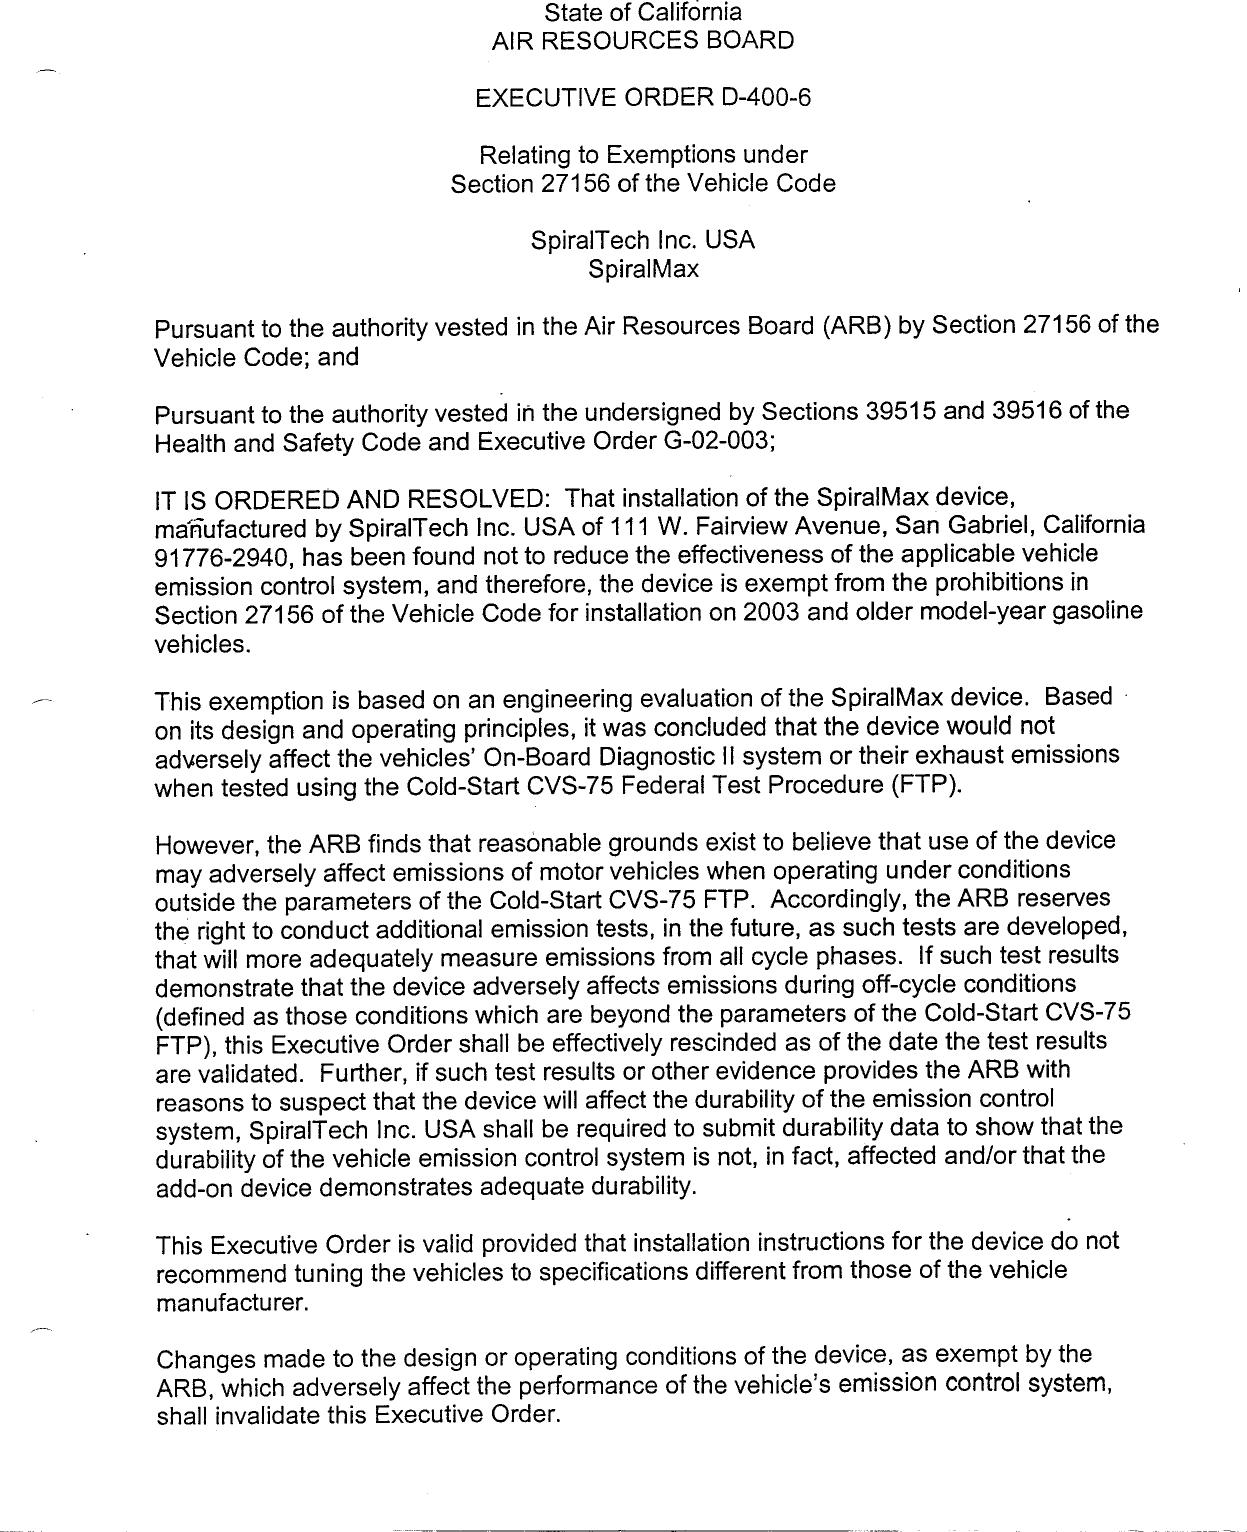 Executive Order D 400 6 Spiraltech Usa Inc